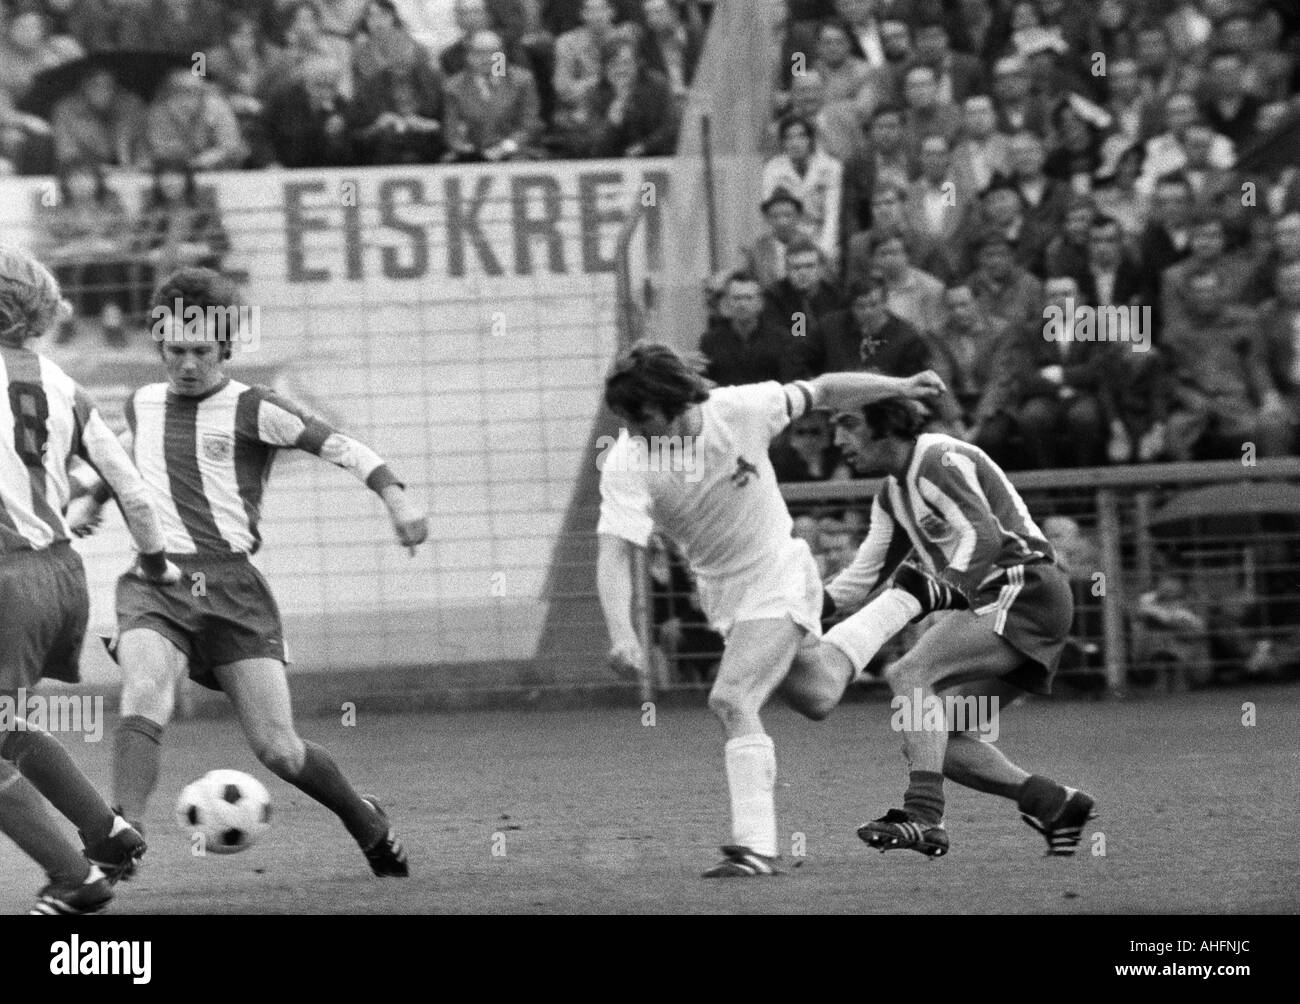 football, Bundesliga, 1971/1972, Stadium Radrennbahn near the Muengersdorfer Stadium in Cologne, 1. FC Cologne versus FC Bayern Munich 1:4, scene of the match, f.l.t.r. Franz Beckenbauer (FCB), Hennes Loehr (Koeln), Franz Krauthausen (FCB) - Stock Image